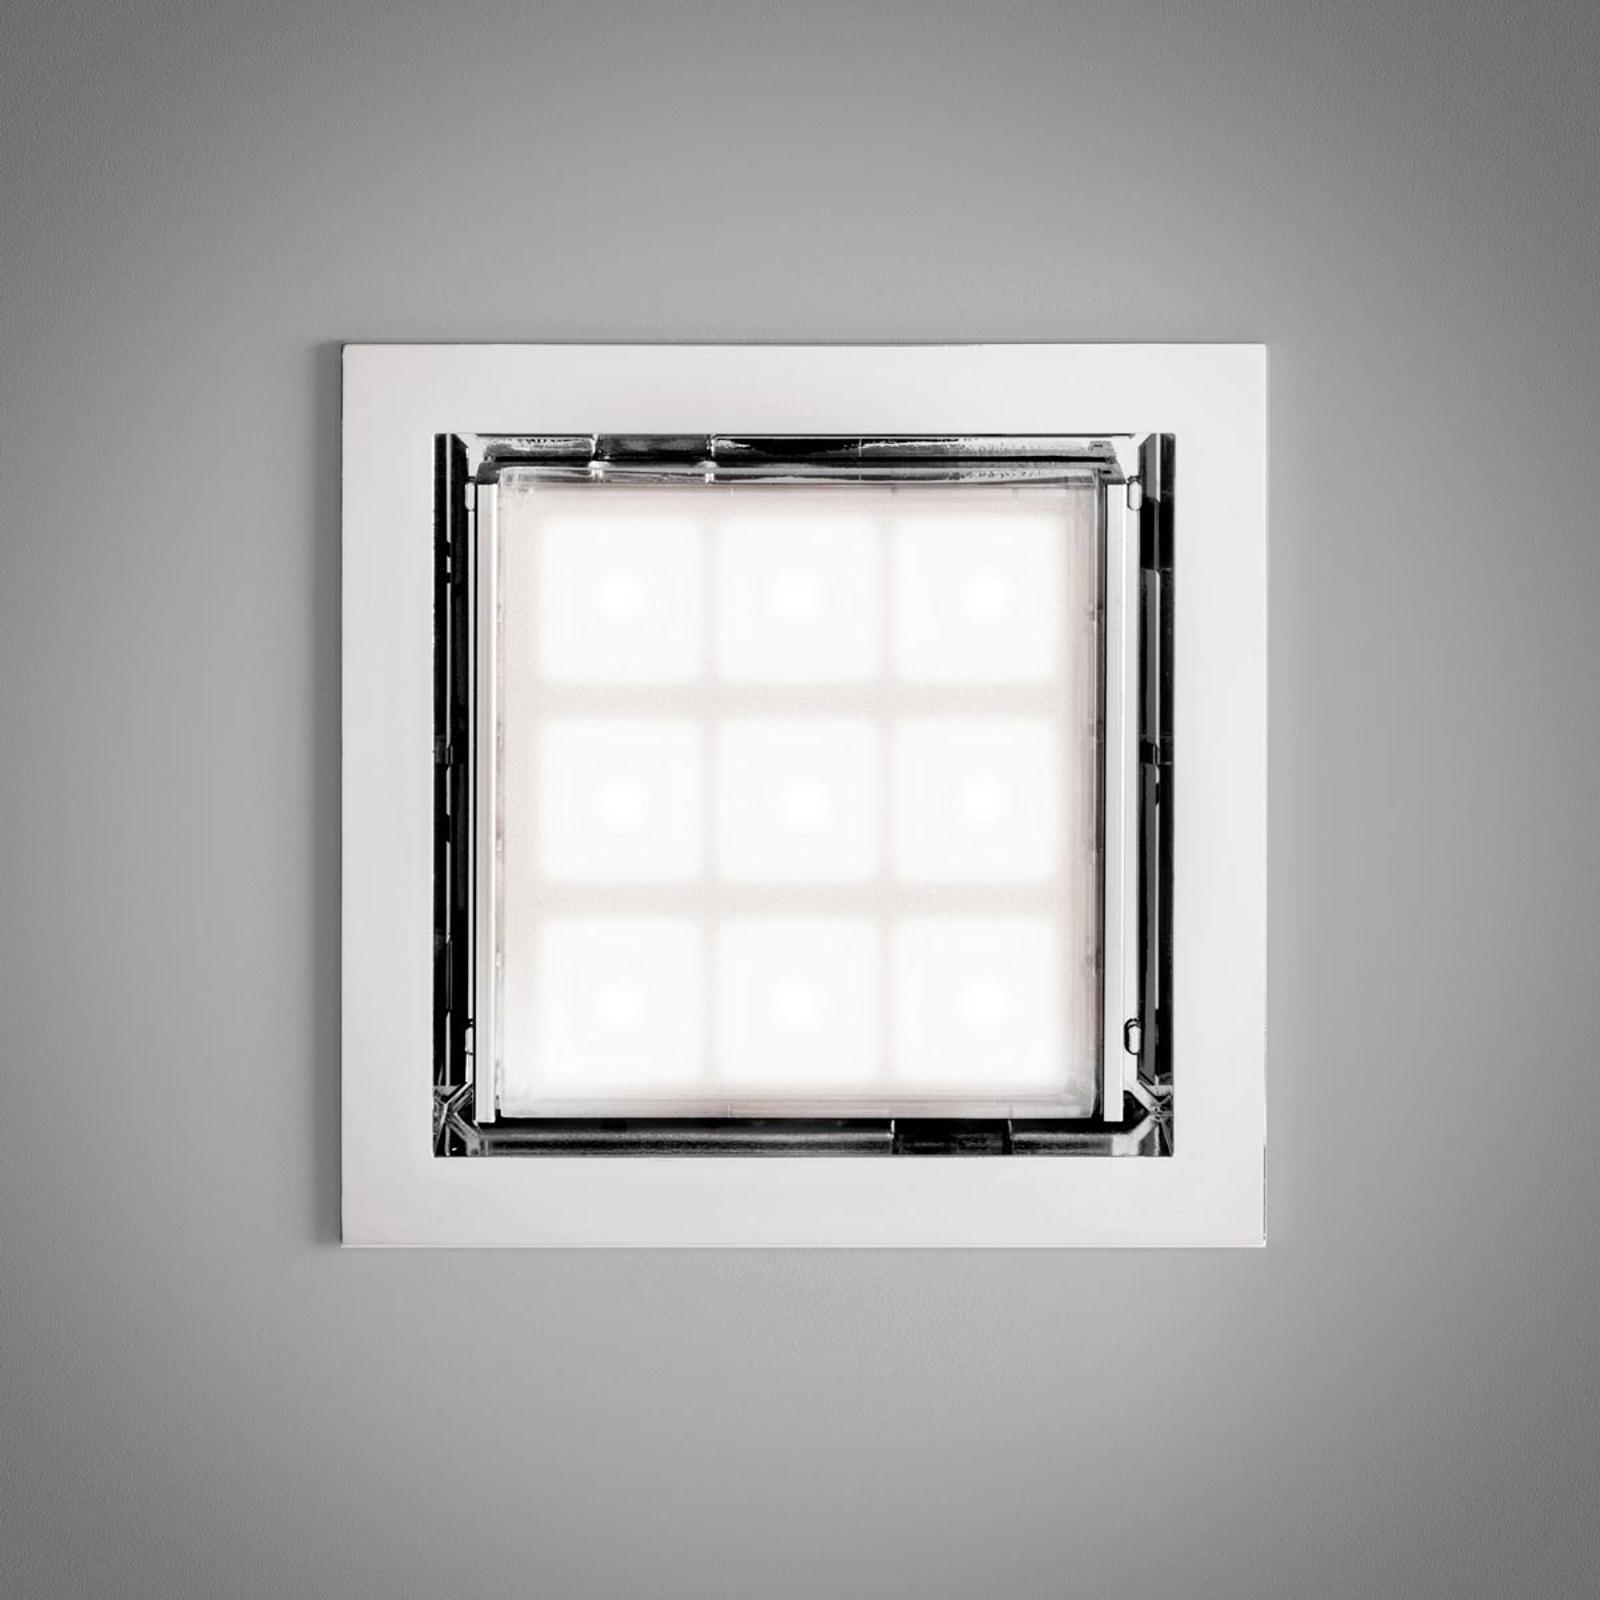 LED taklampen PAD 80 med justerbar linse